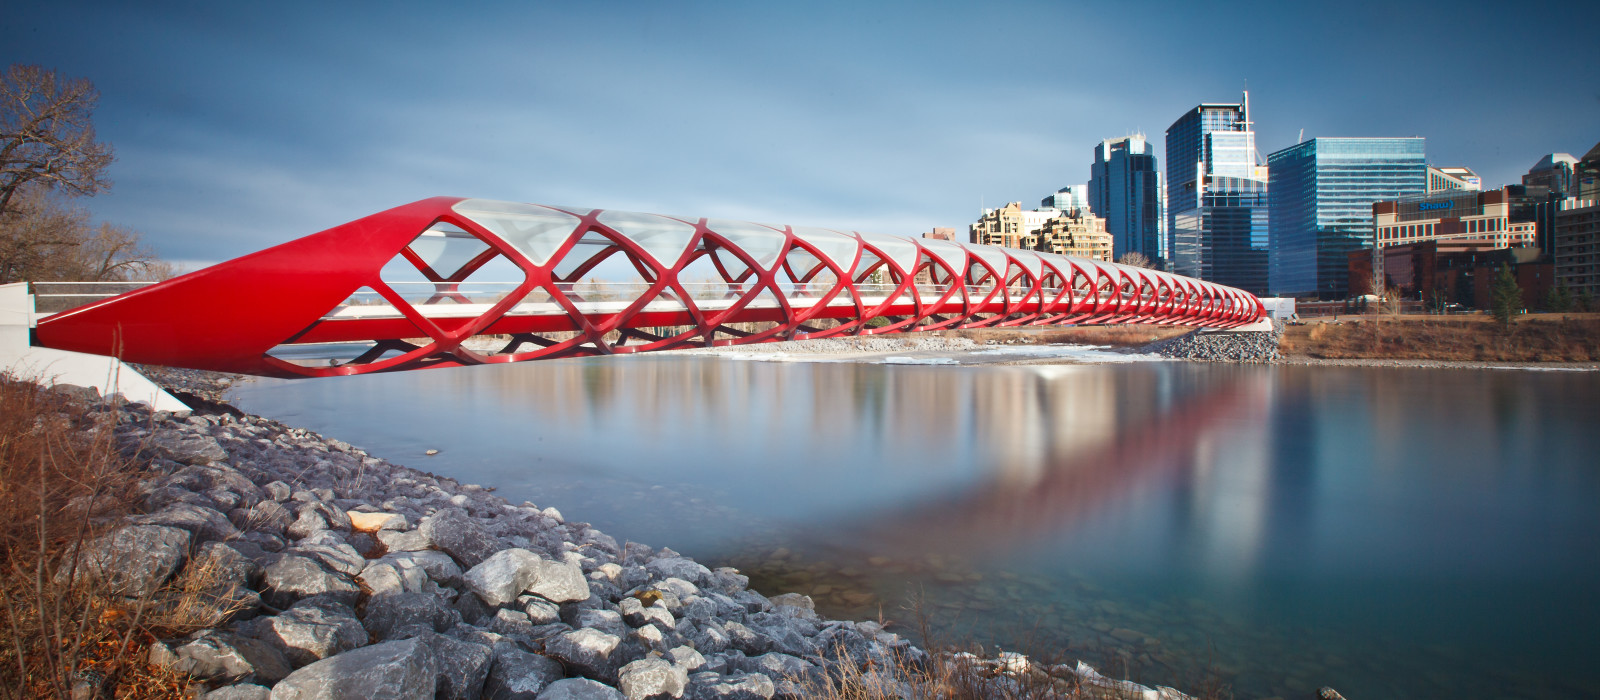 Kanada mit dem Zug – Ozean, Prärie & Rocky Mountains Urlaub 1